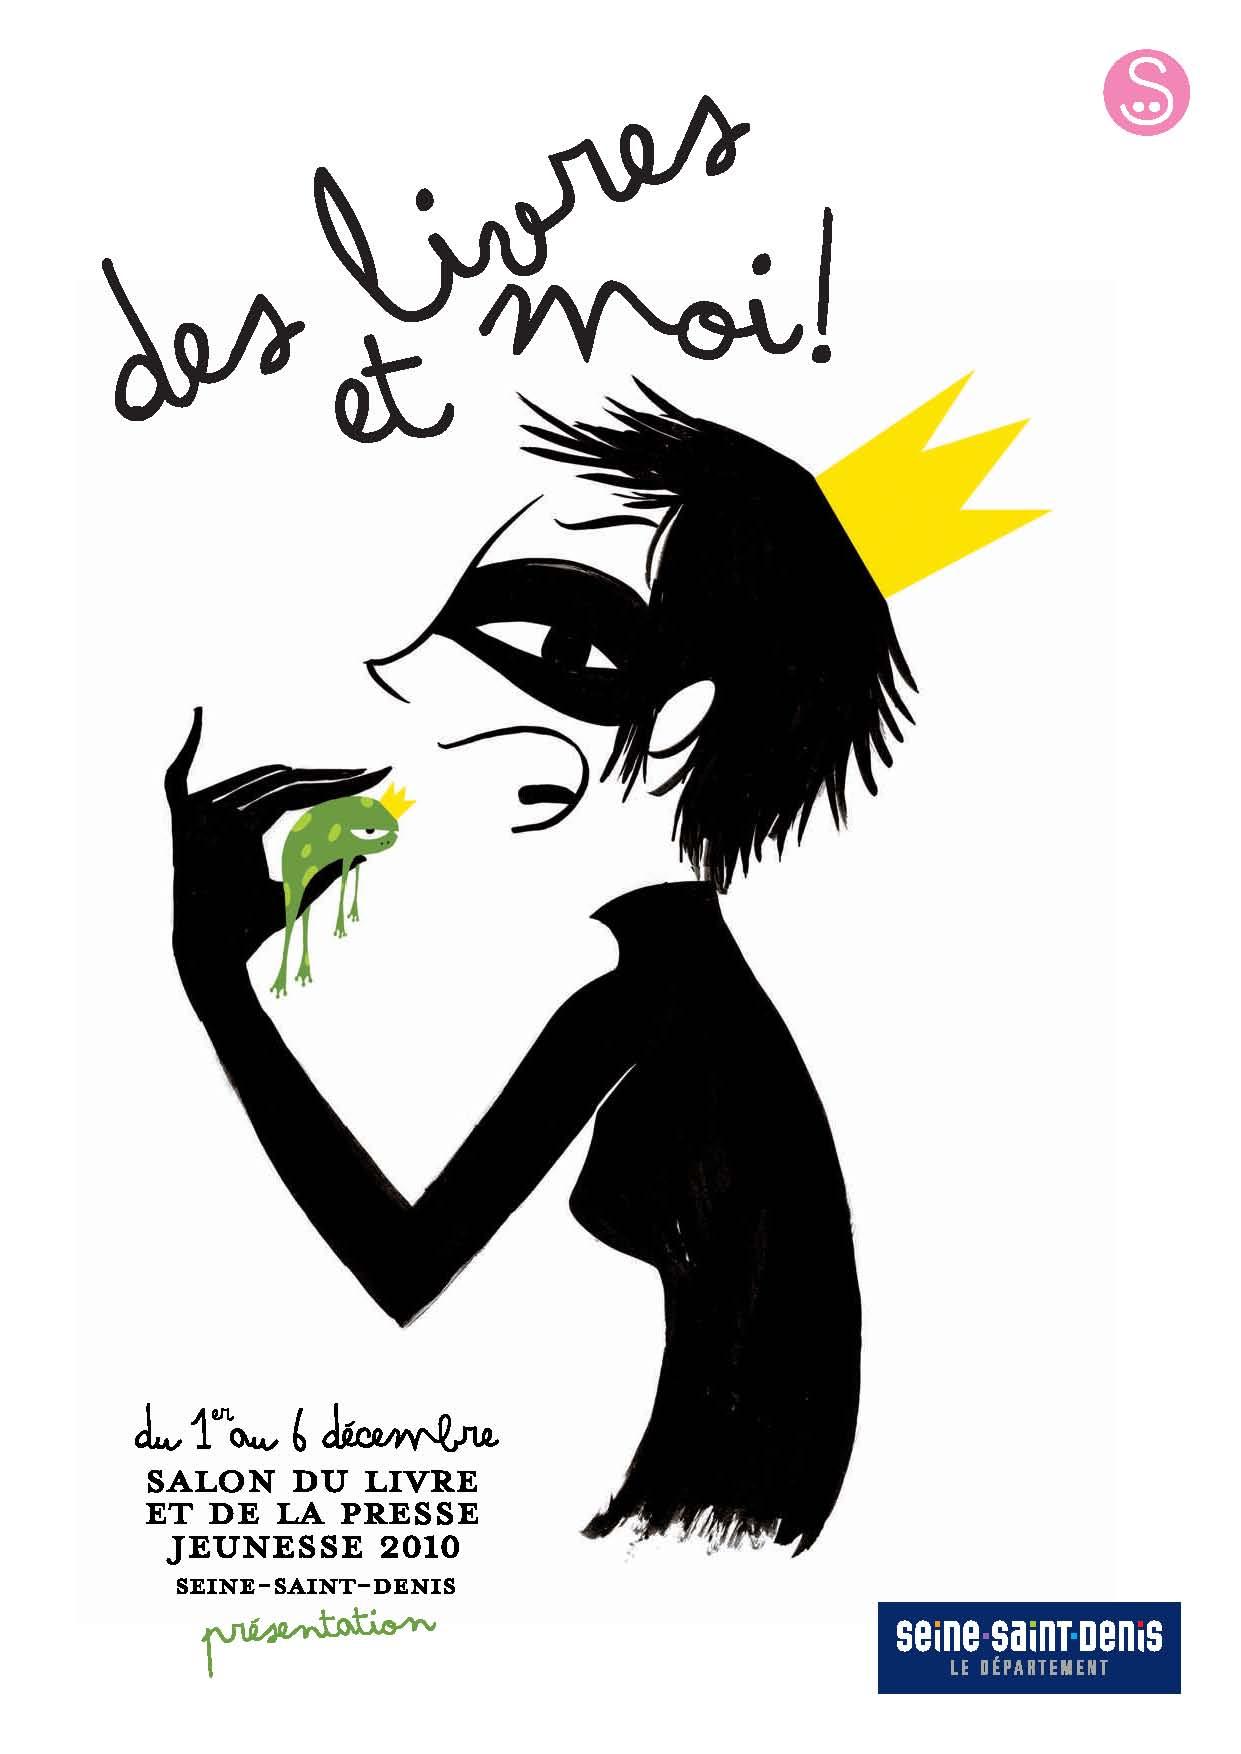 Ibby european newsletter november 2010 - Salon du livre jeunesse de montreuil ...